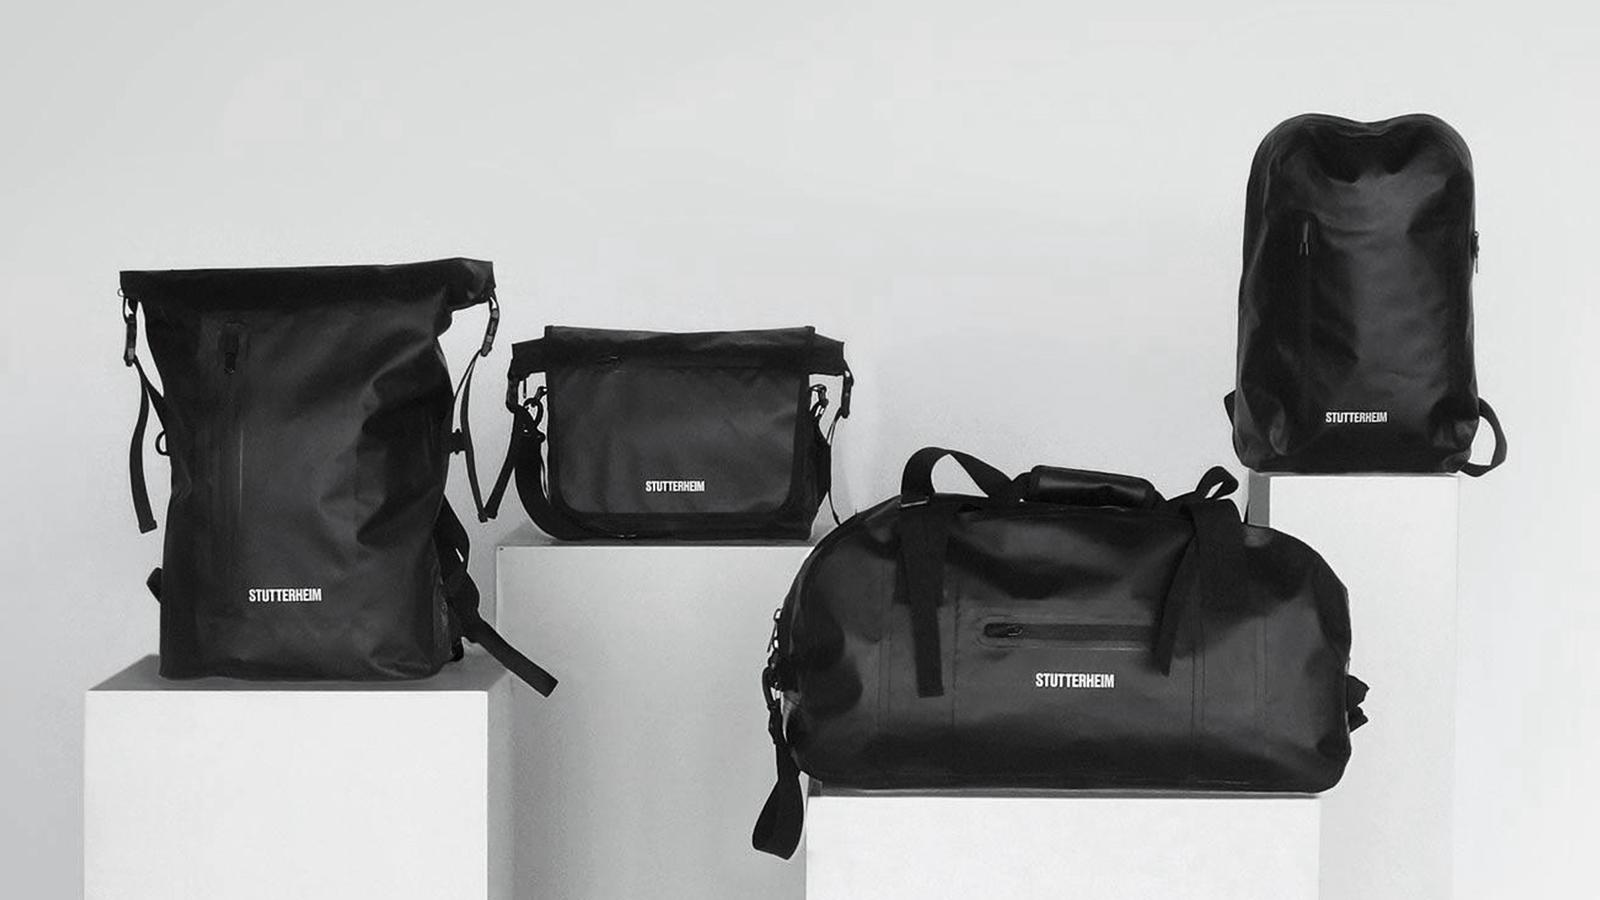 Stutterheim Water-Resistant Bags